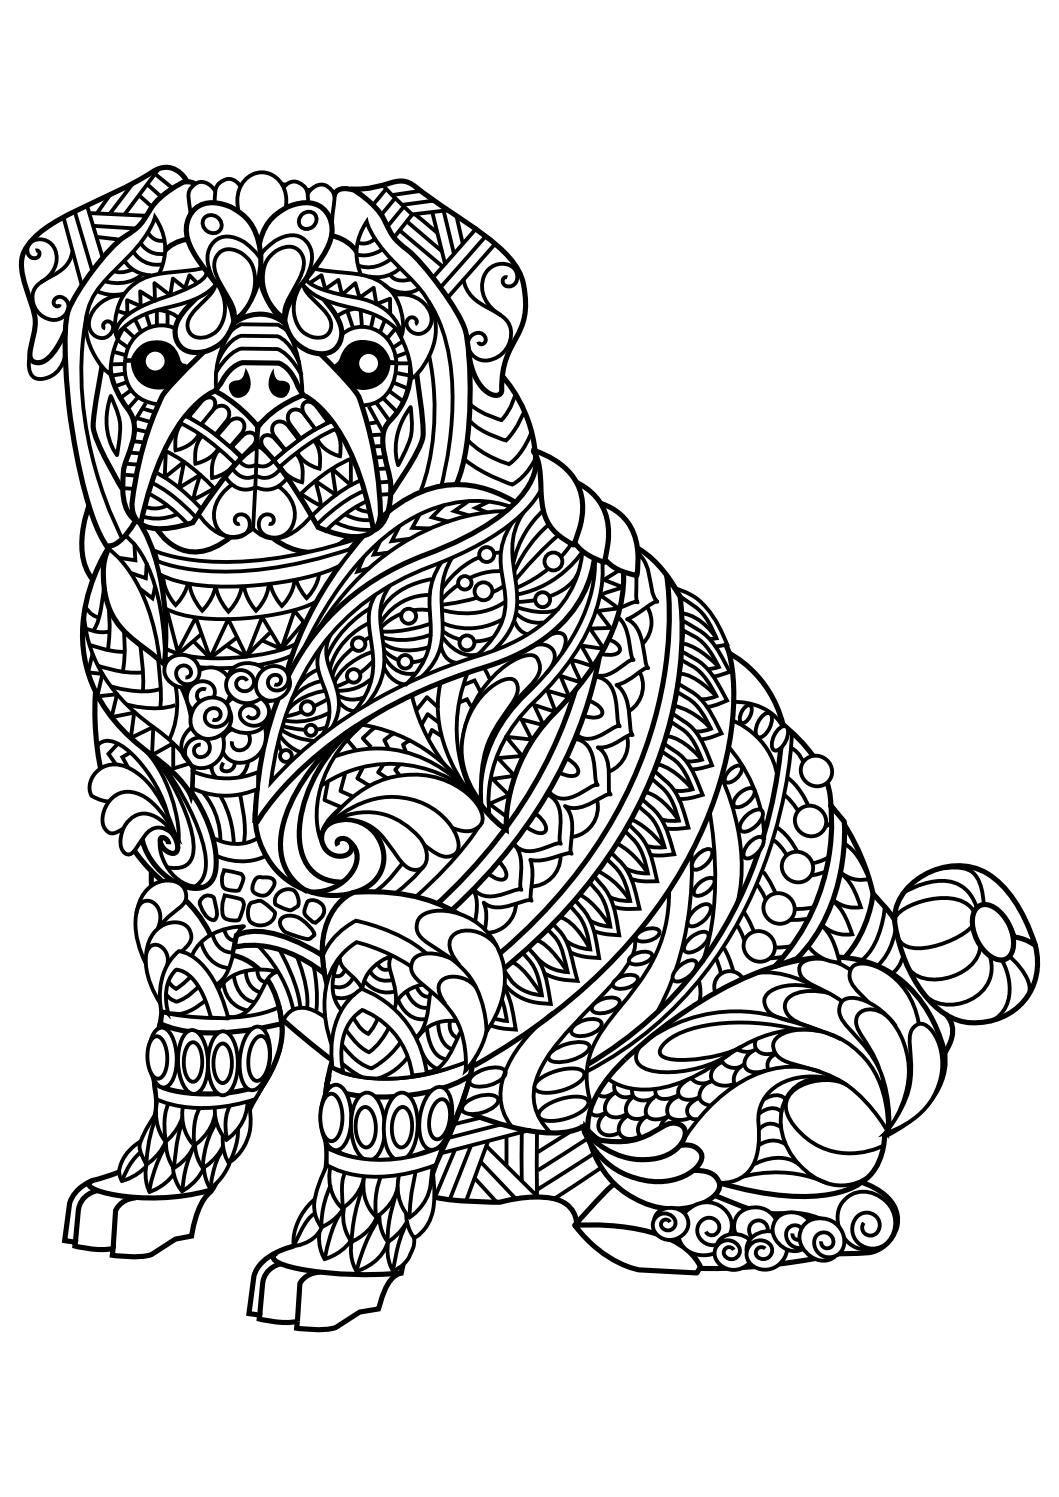 Animal coloring pages pdf coloring pages pinterest kolorowanki